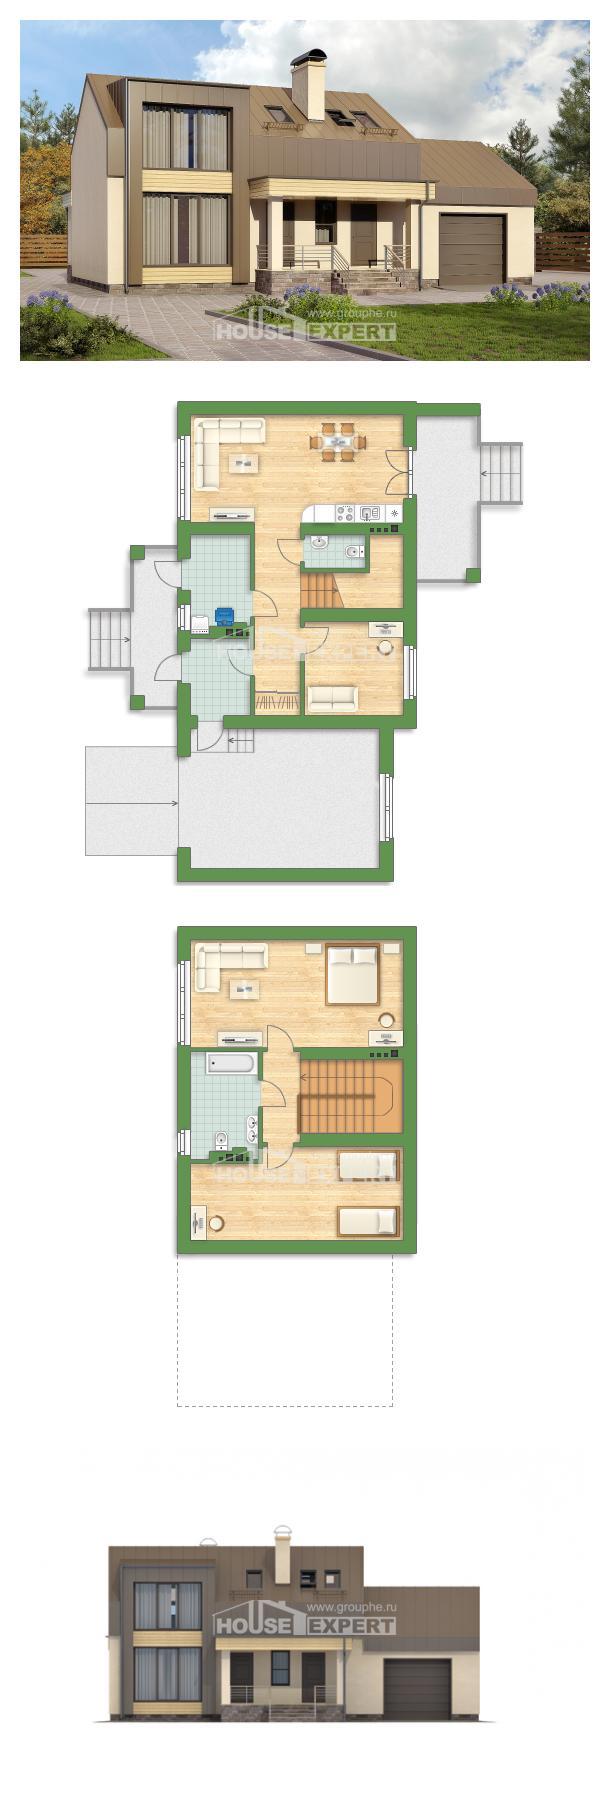 Projekt domu 150-015-L | House Expert